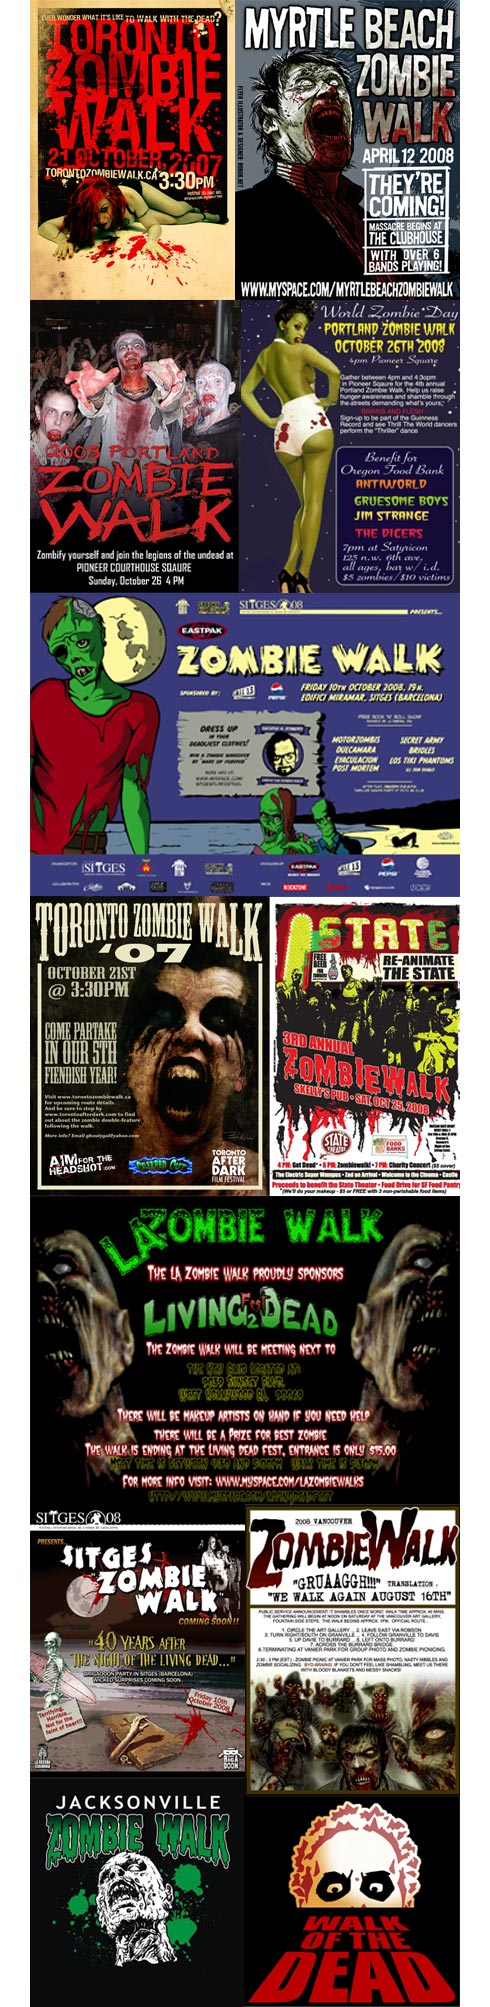 zombie-walk-posters